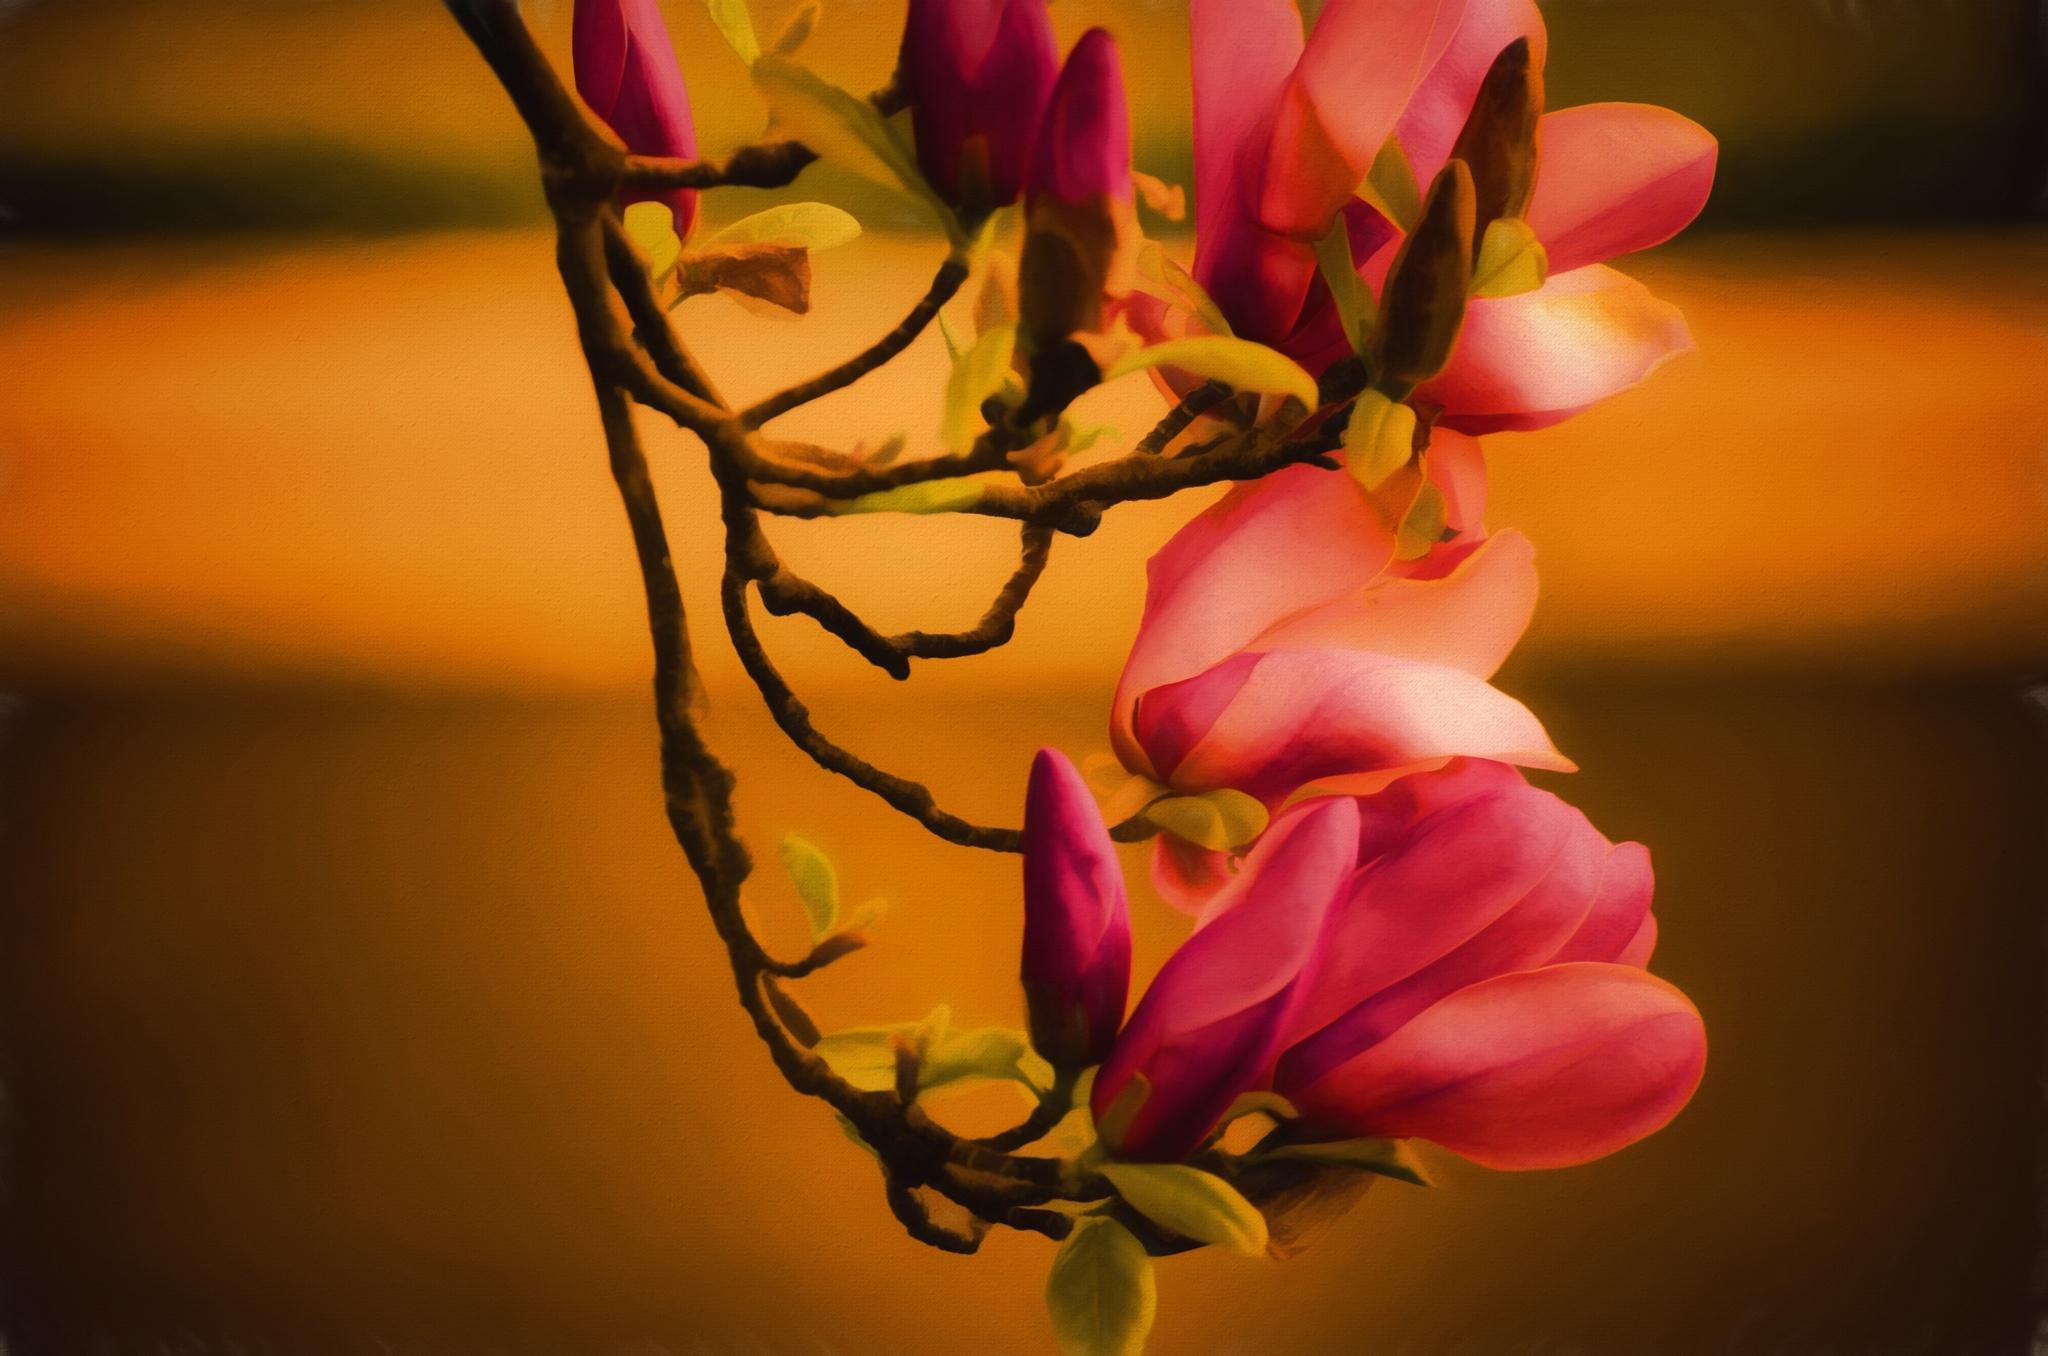 Magnolia Dreams 4310 by JohnEllingson